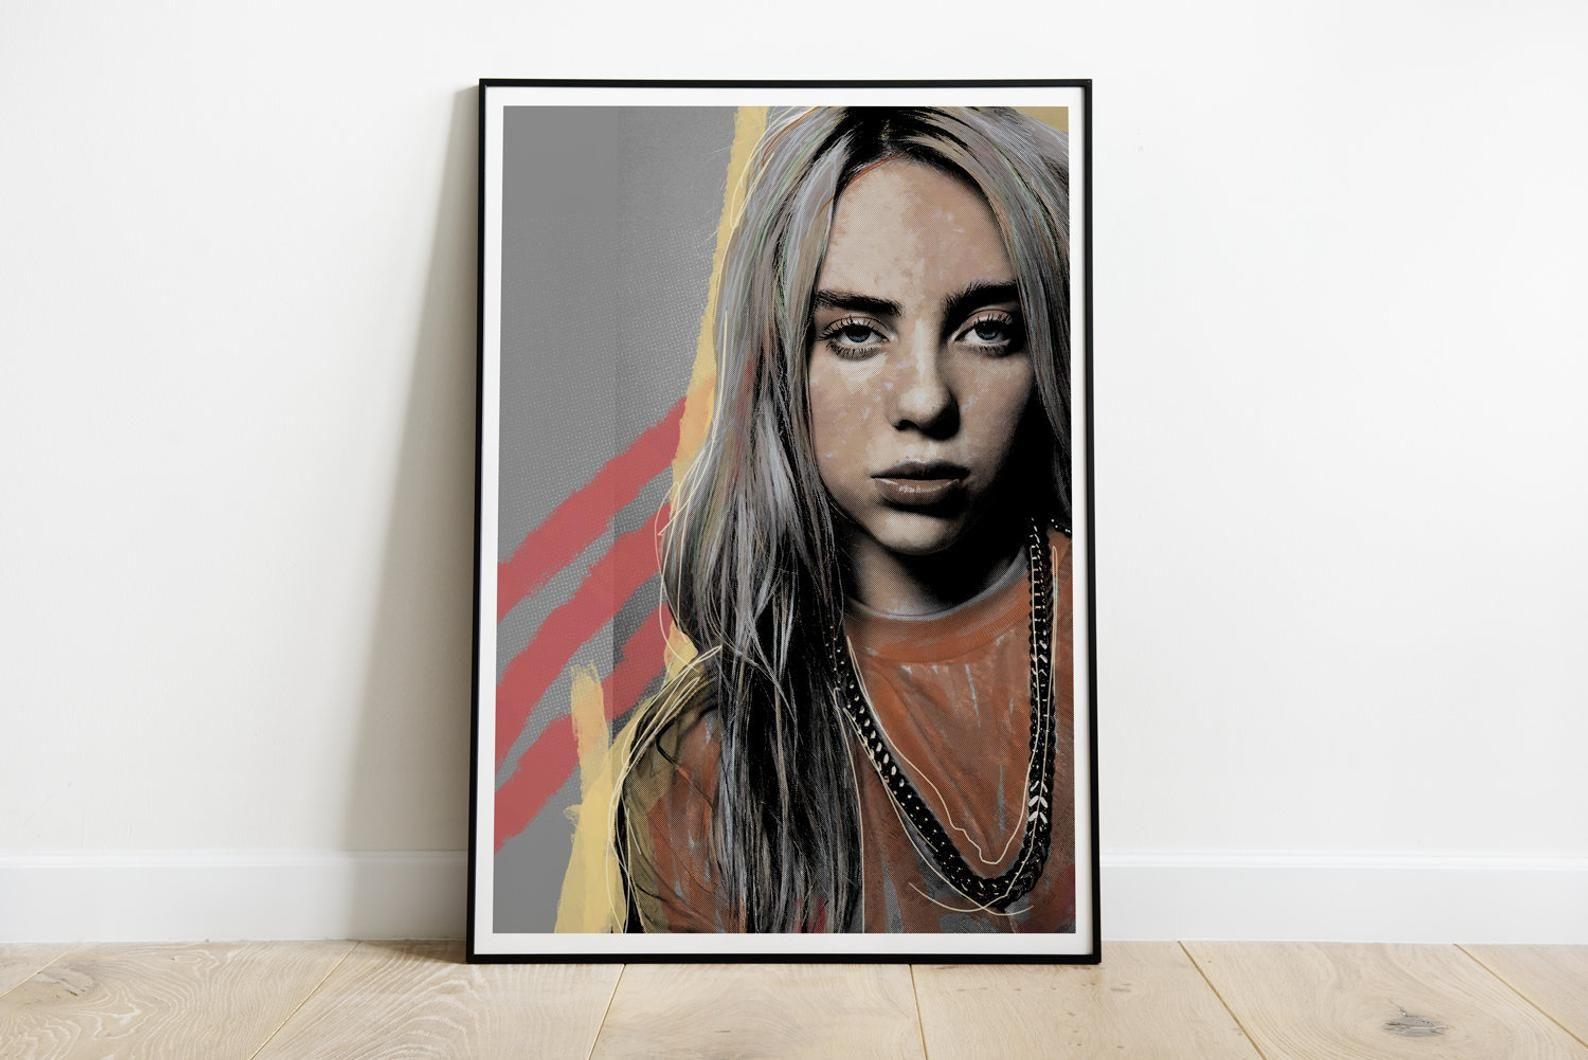 Billie Eilish Pop Music Singer Art Fabric HD Print Poster Wall Decor Multi Sizes